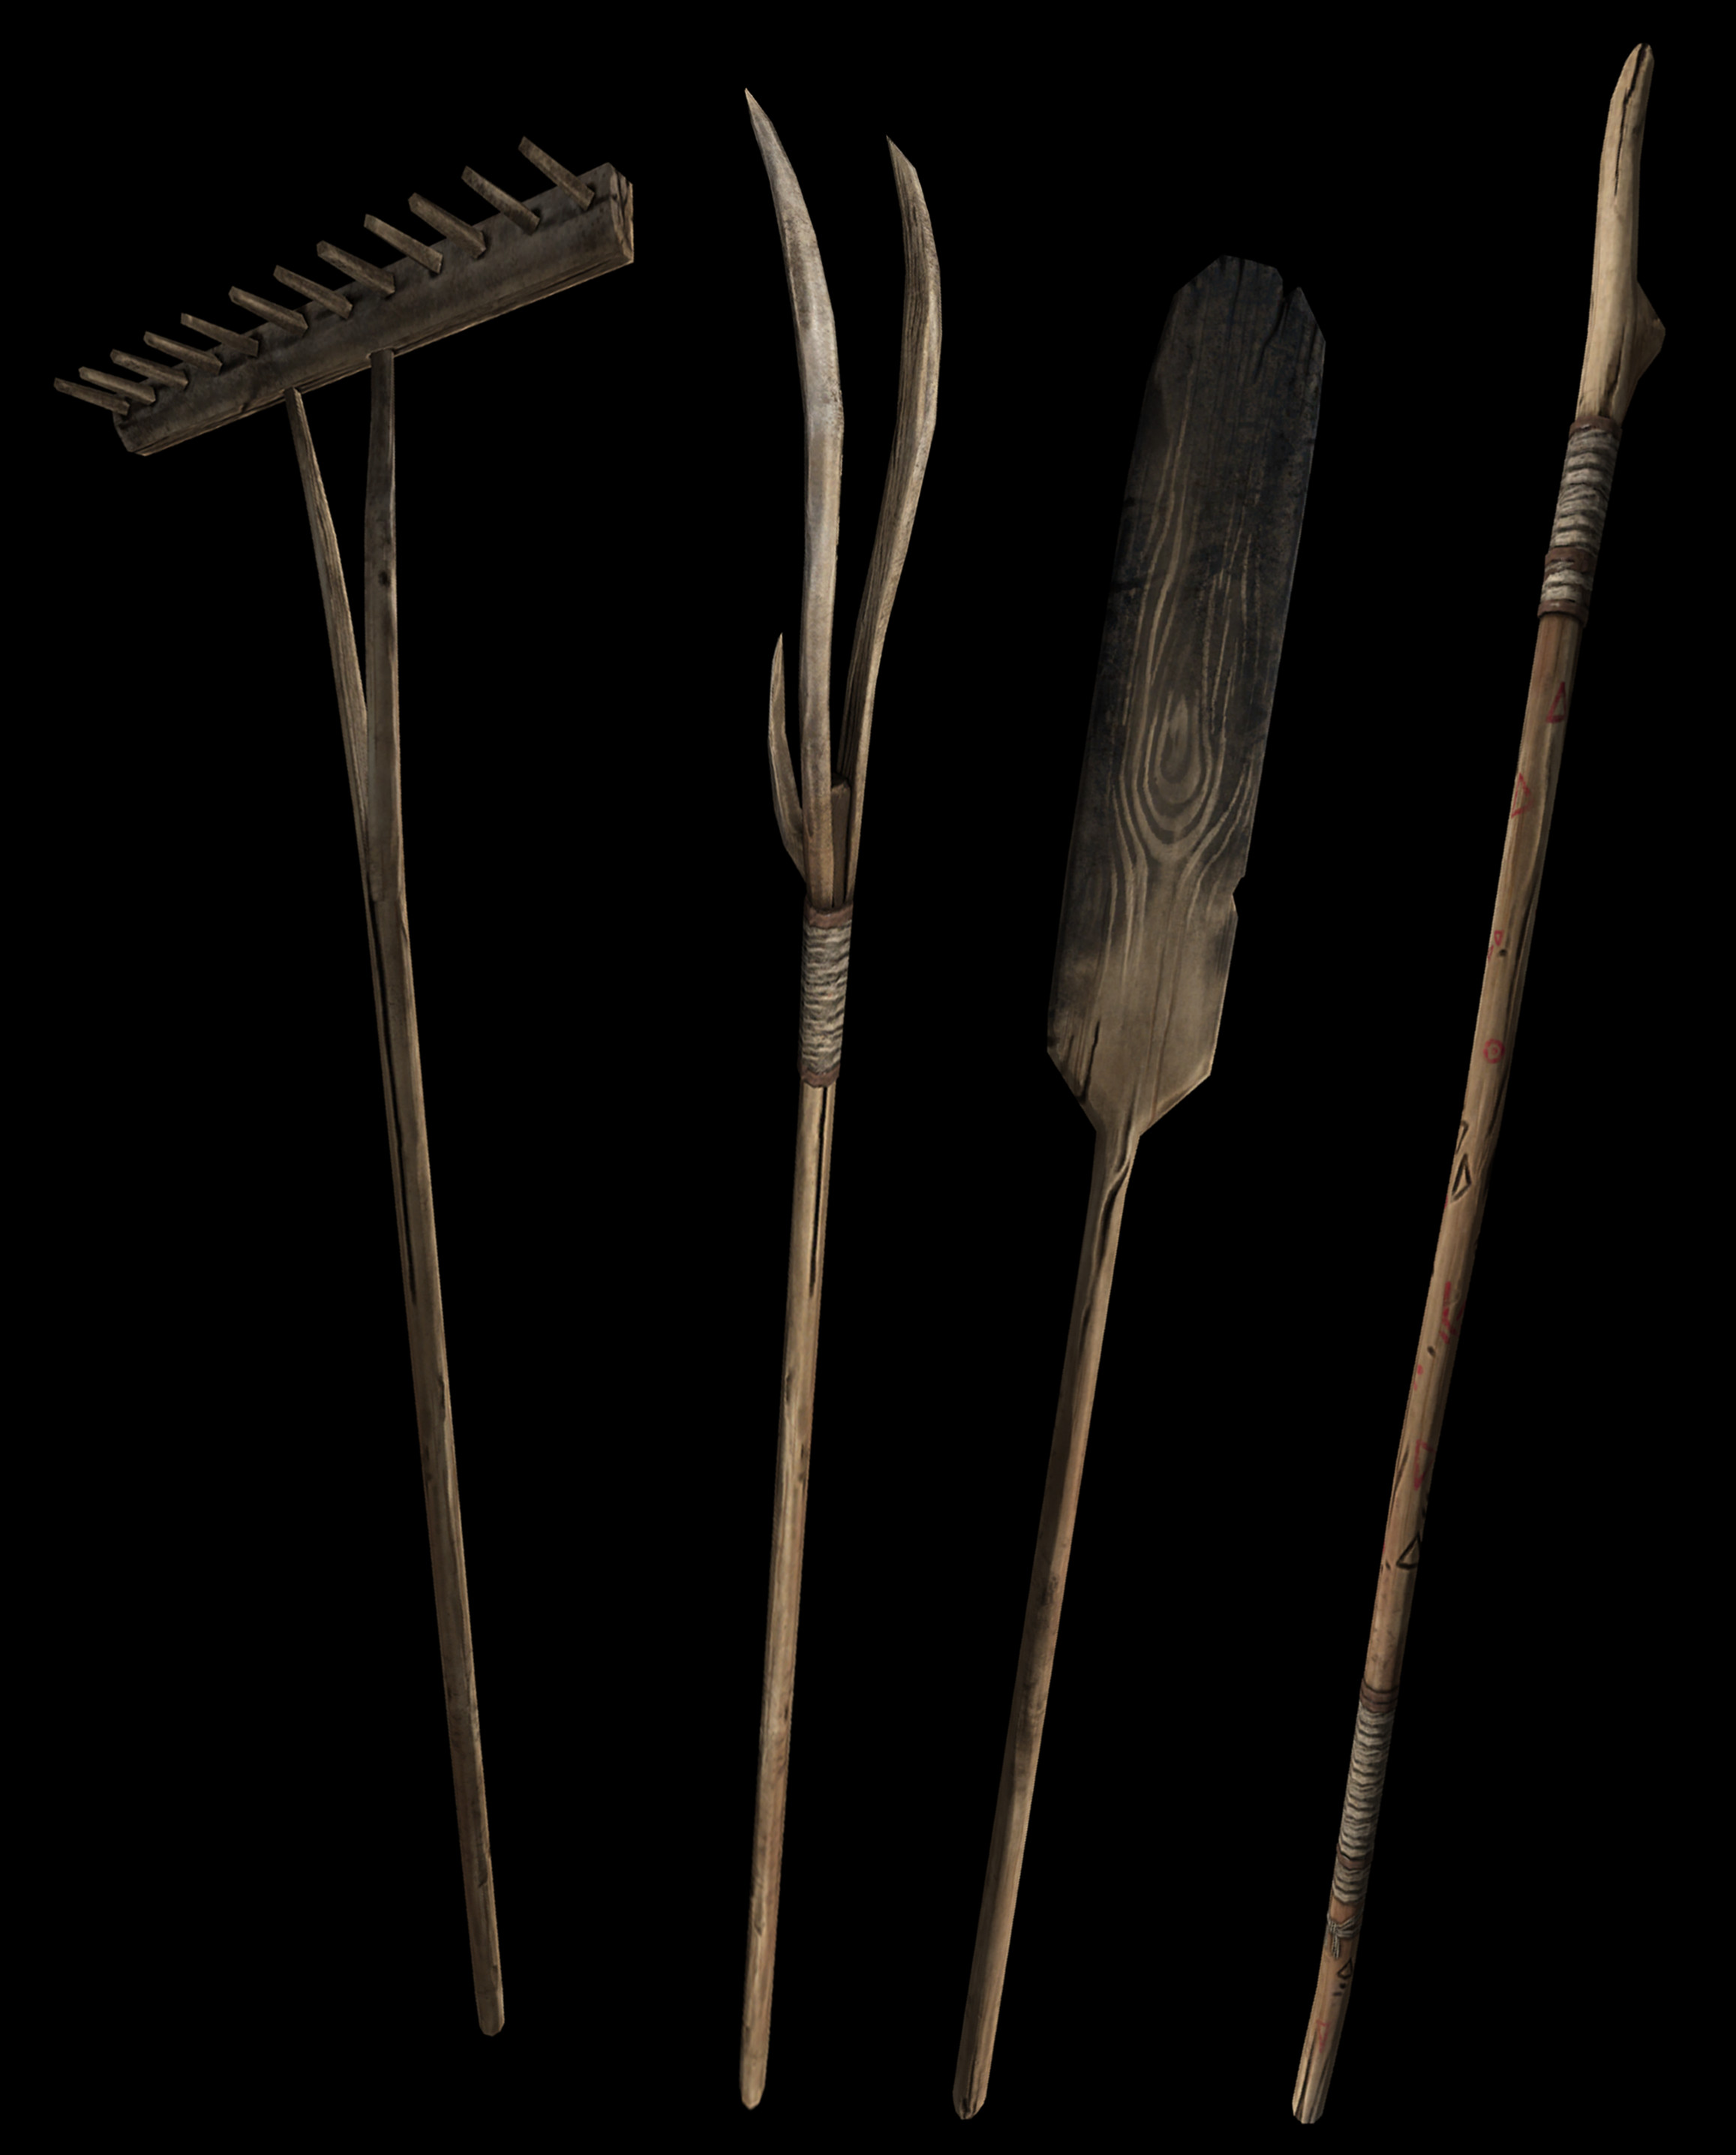 Rake, pitchfork, bread peel, pilgrim's staff